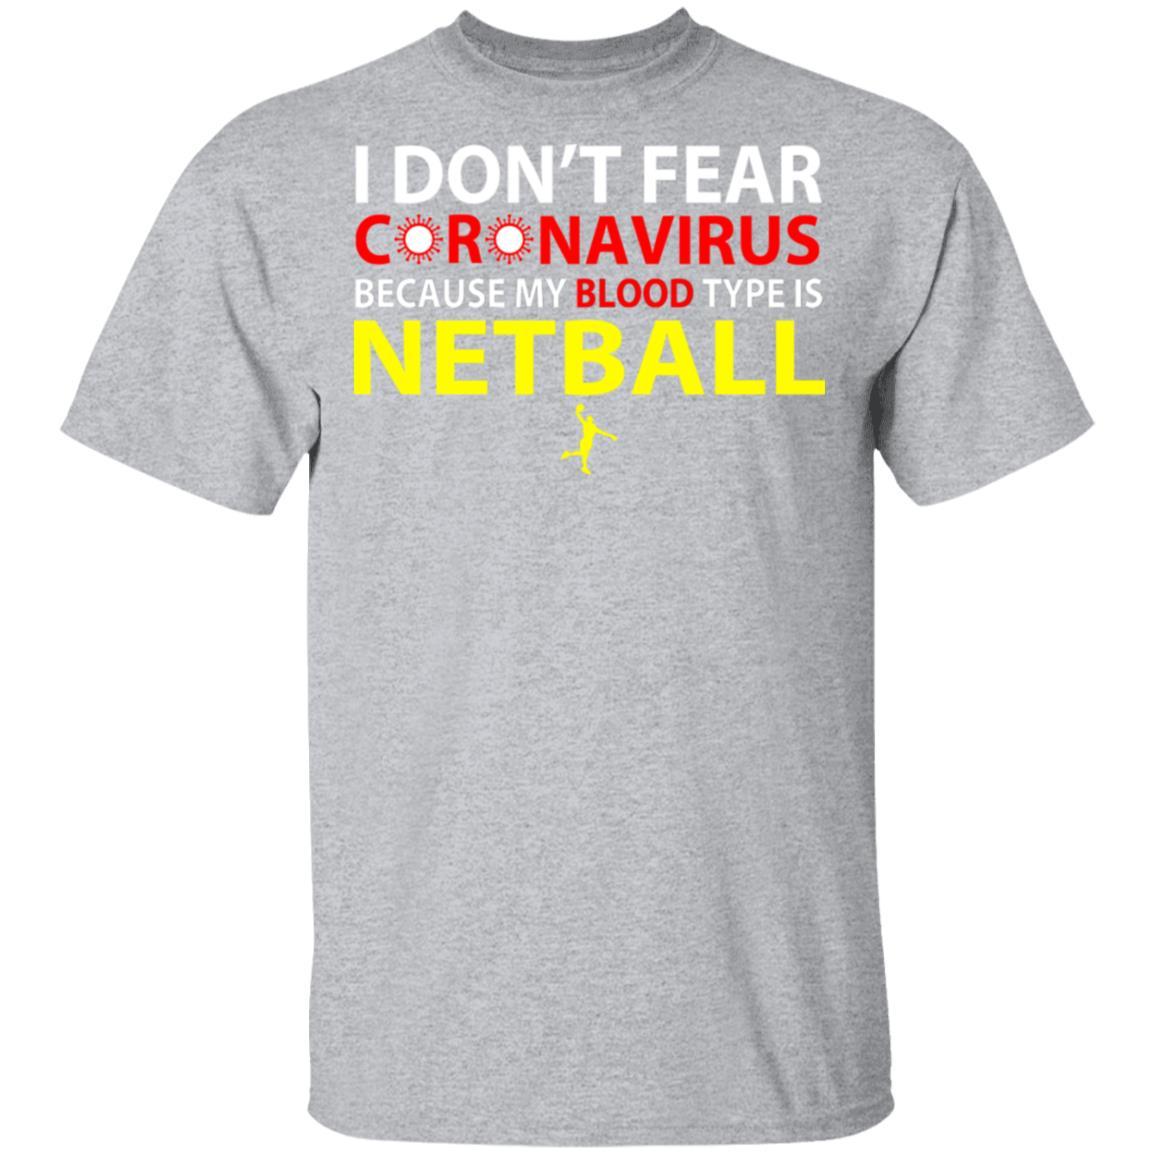 I Don't Fear Coronavirus Because My Blood Type Is Netball ...